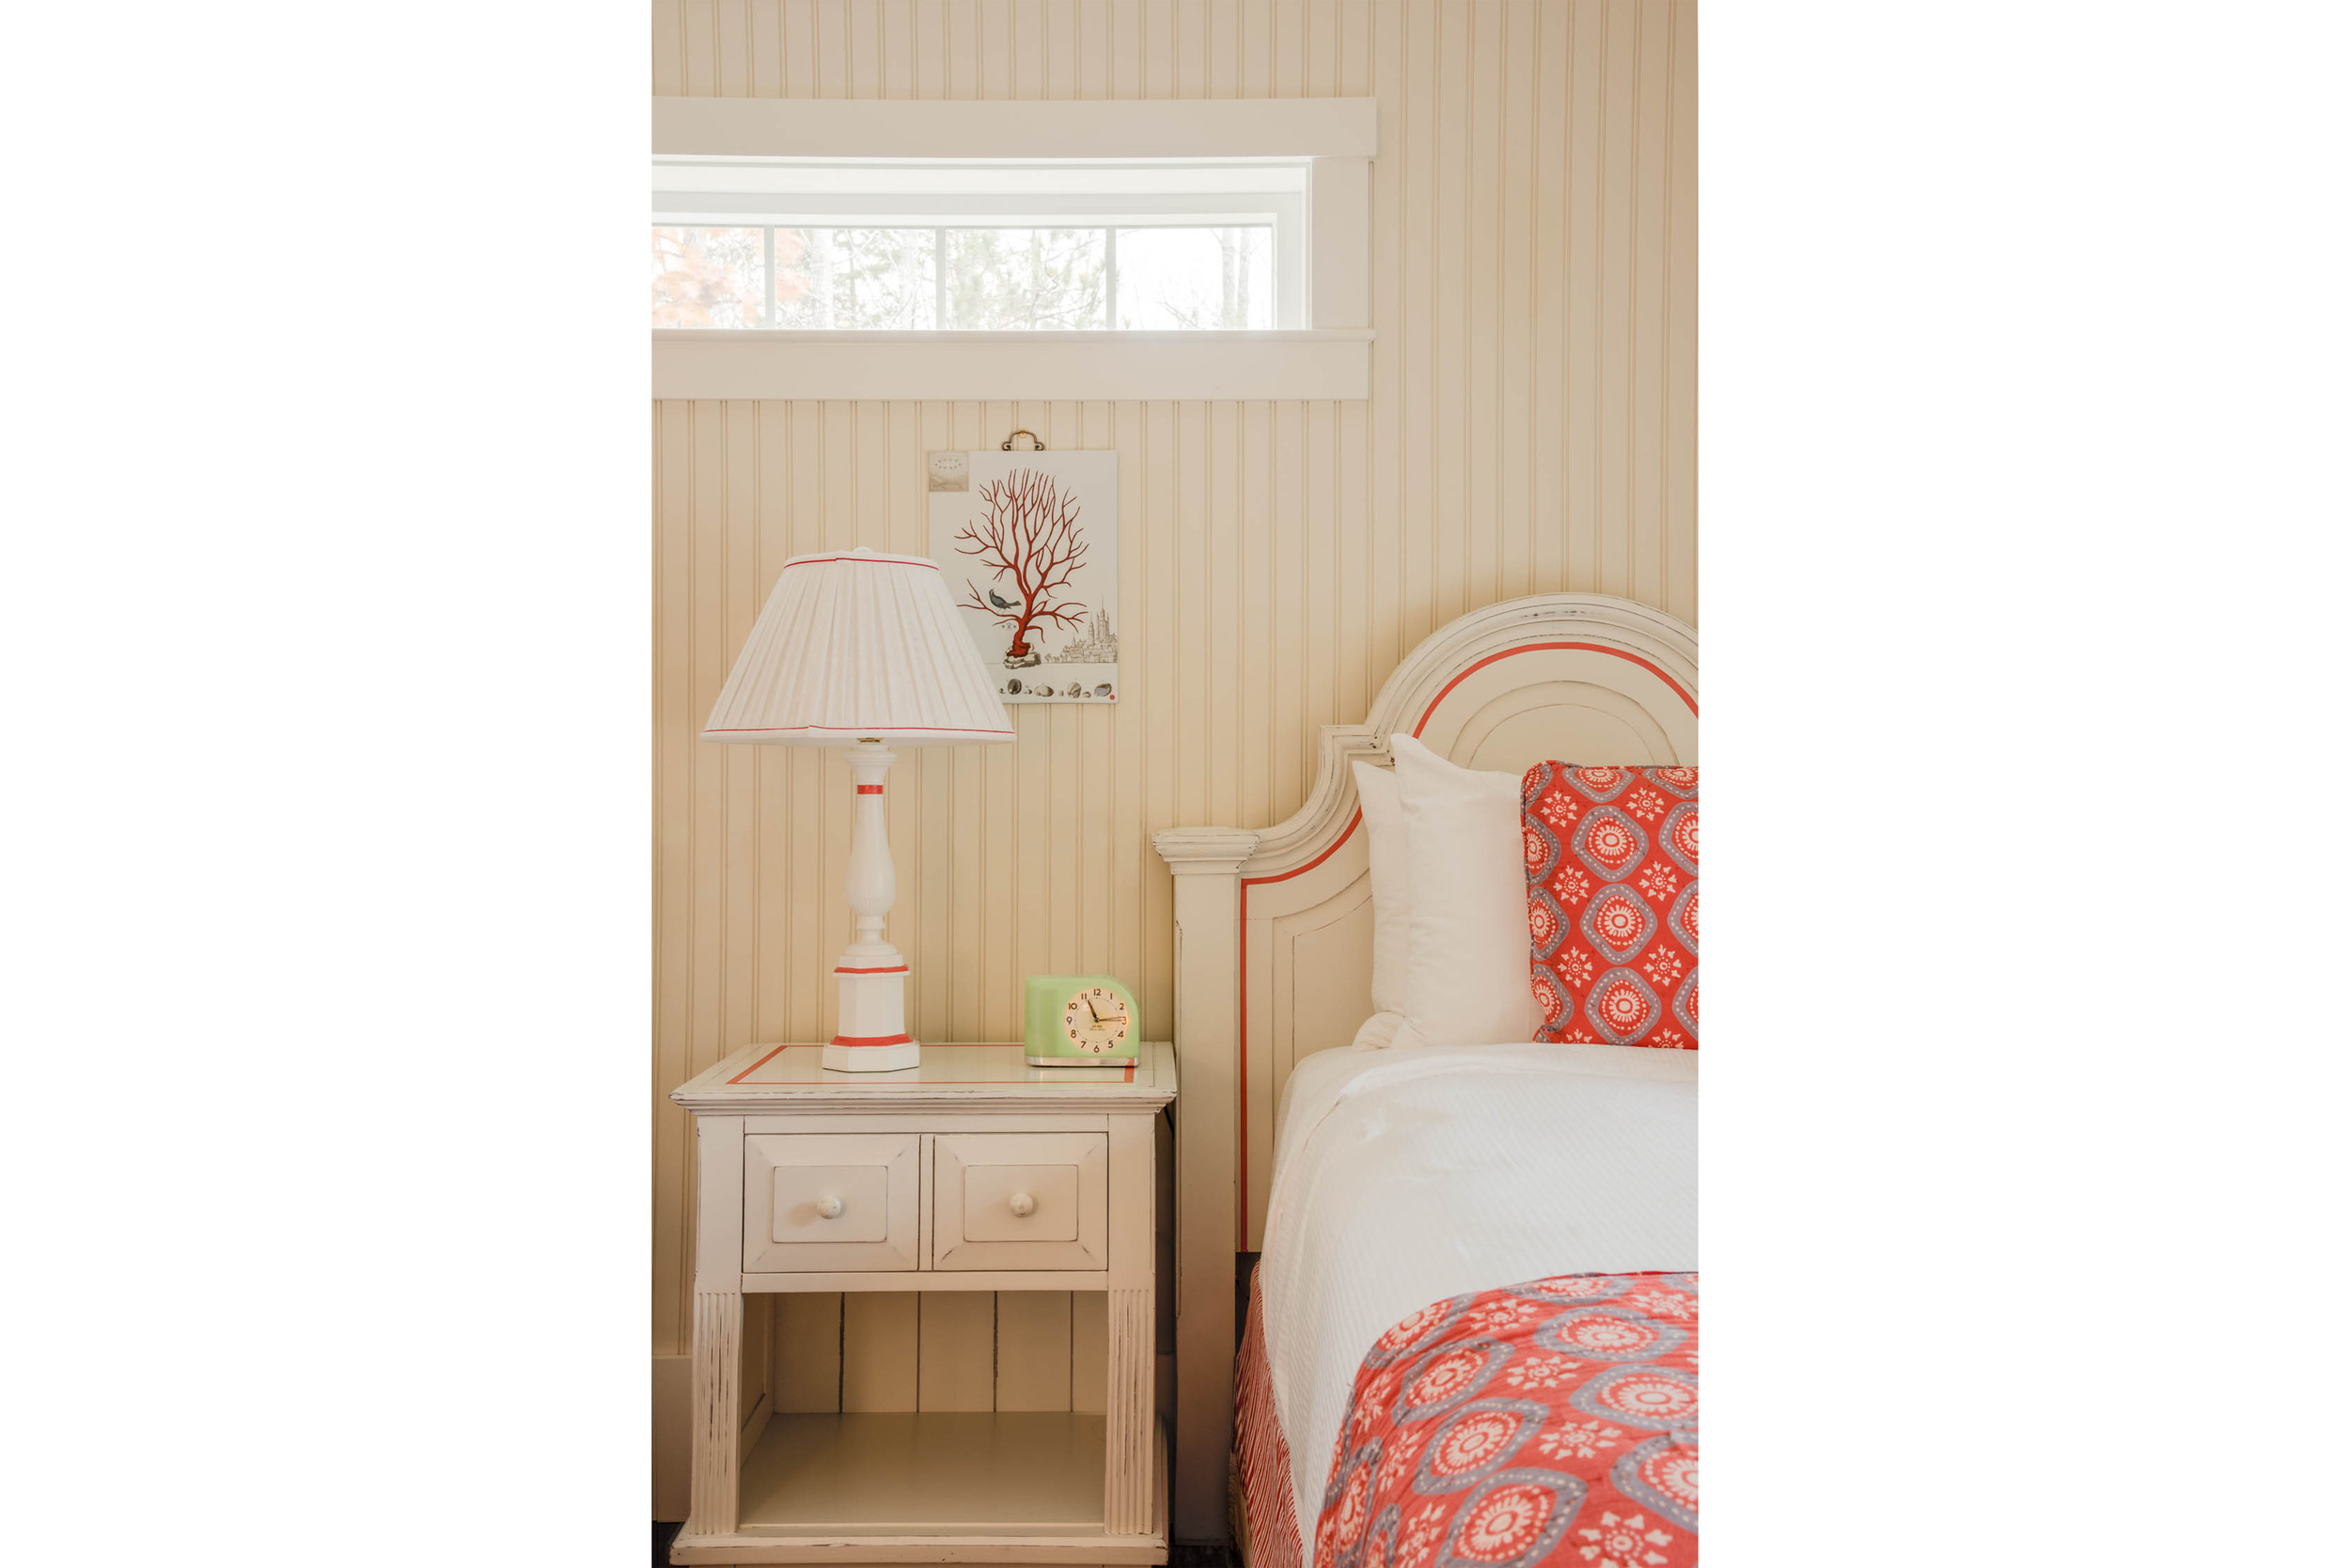 bed2correctedlit copy 5-2.jpg